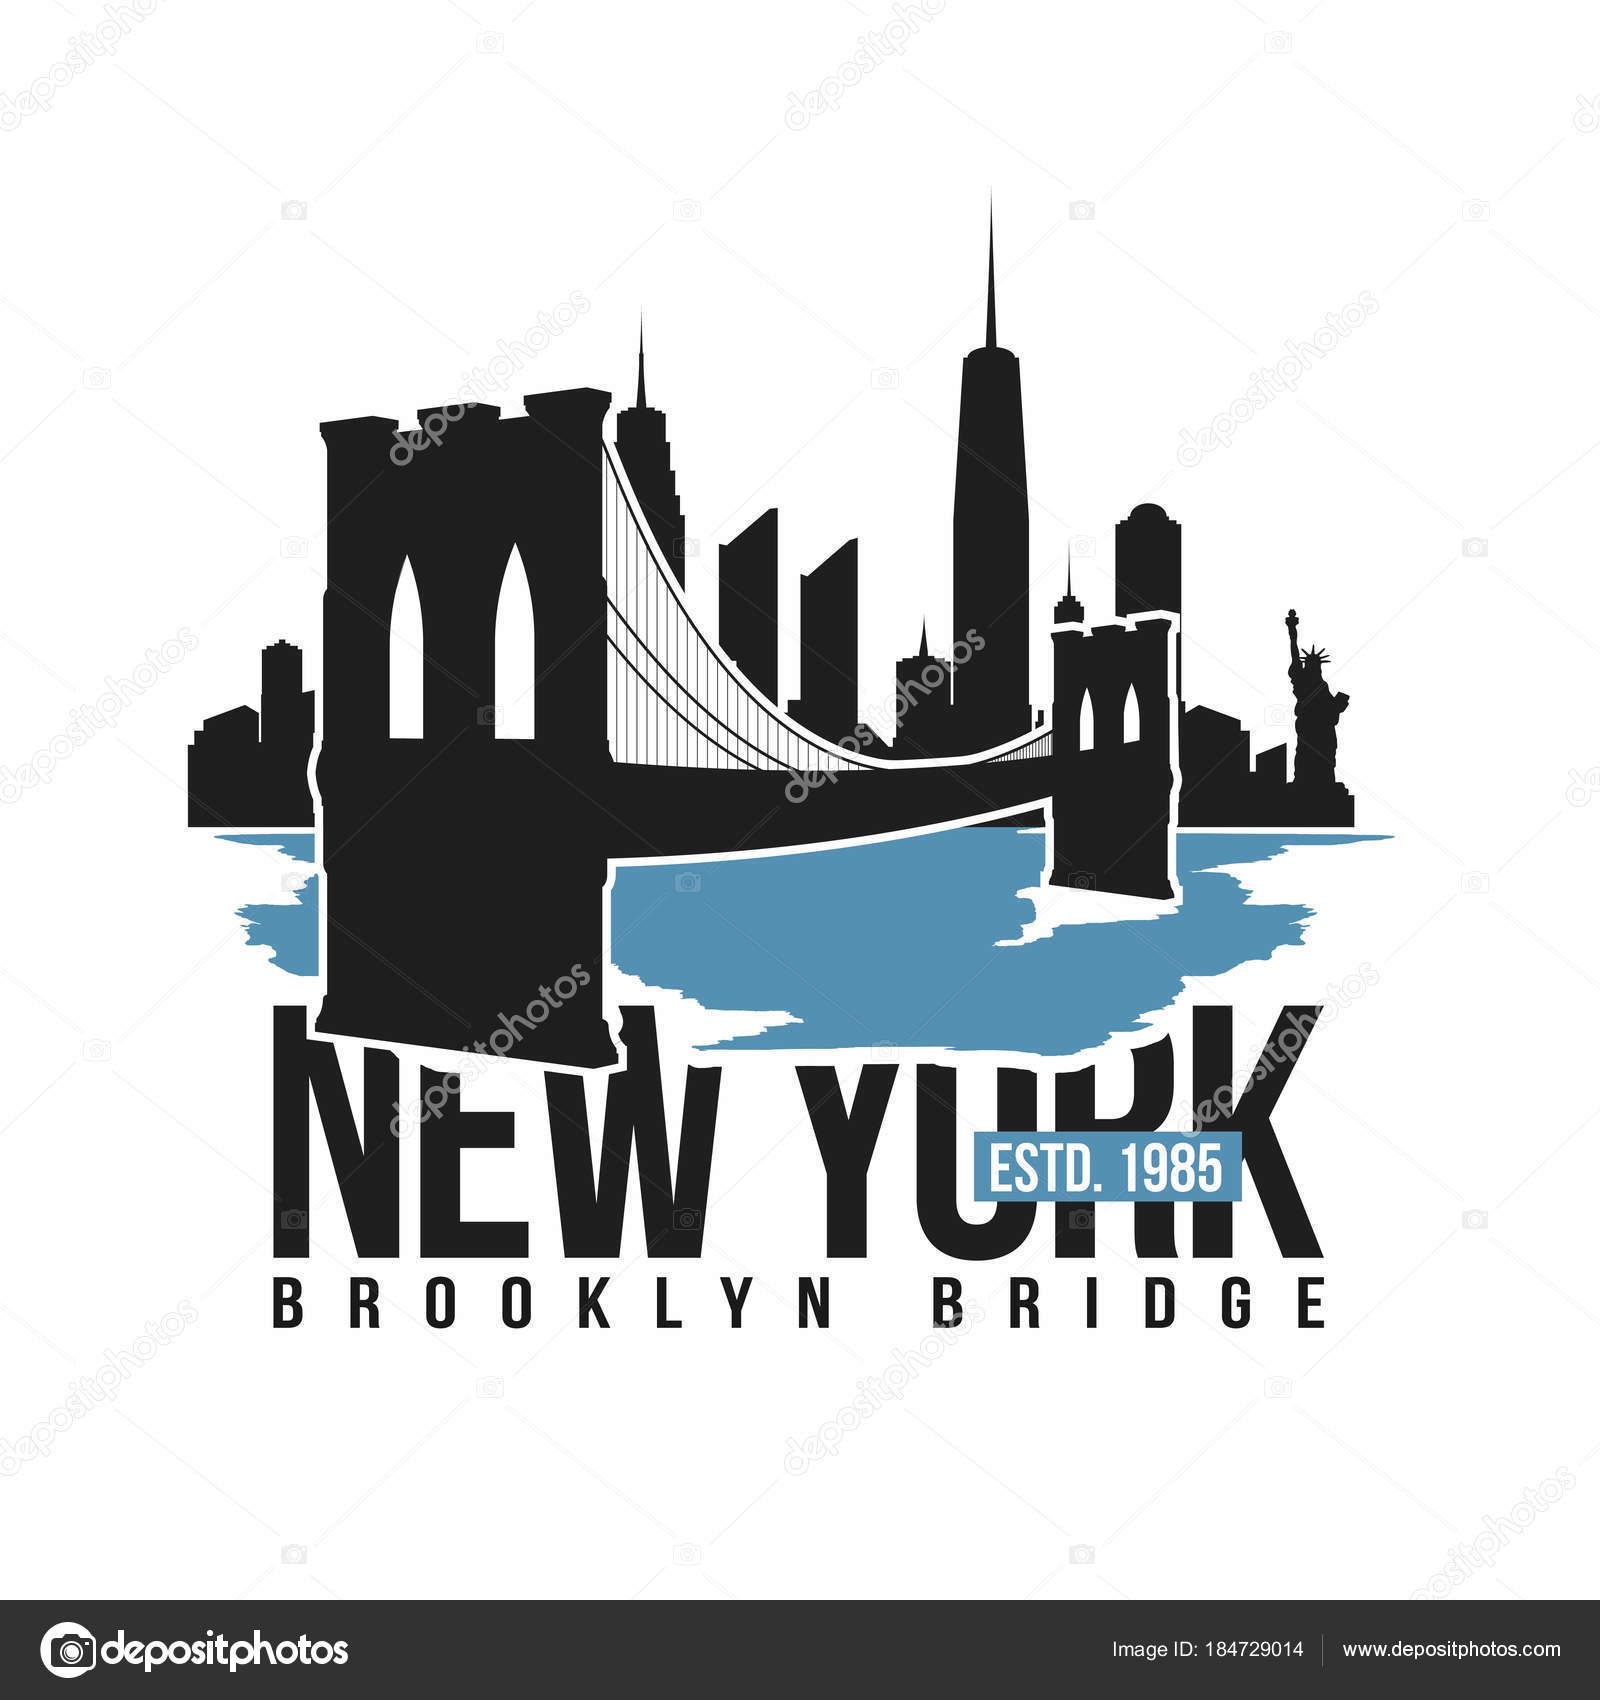 cd6b48bd New York, Brooklyn Bridge typography for t-shirt print. Stylized Brooklyn  Bridge silhouette. Tee shirt graphic, t-shirt design.